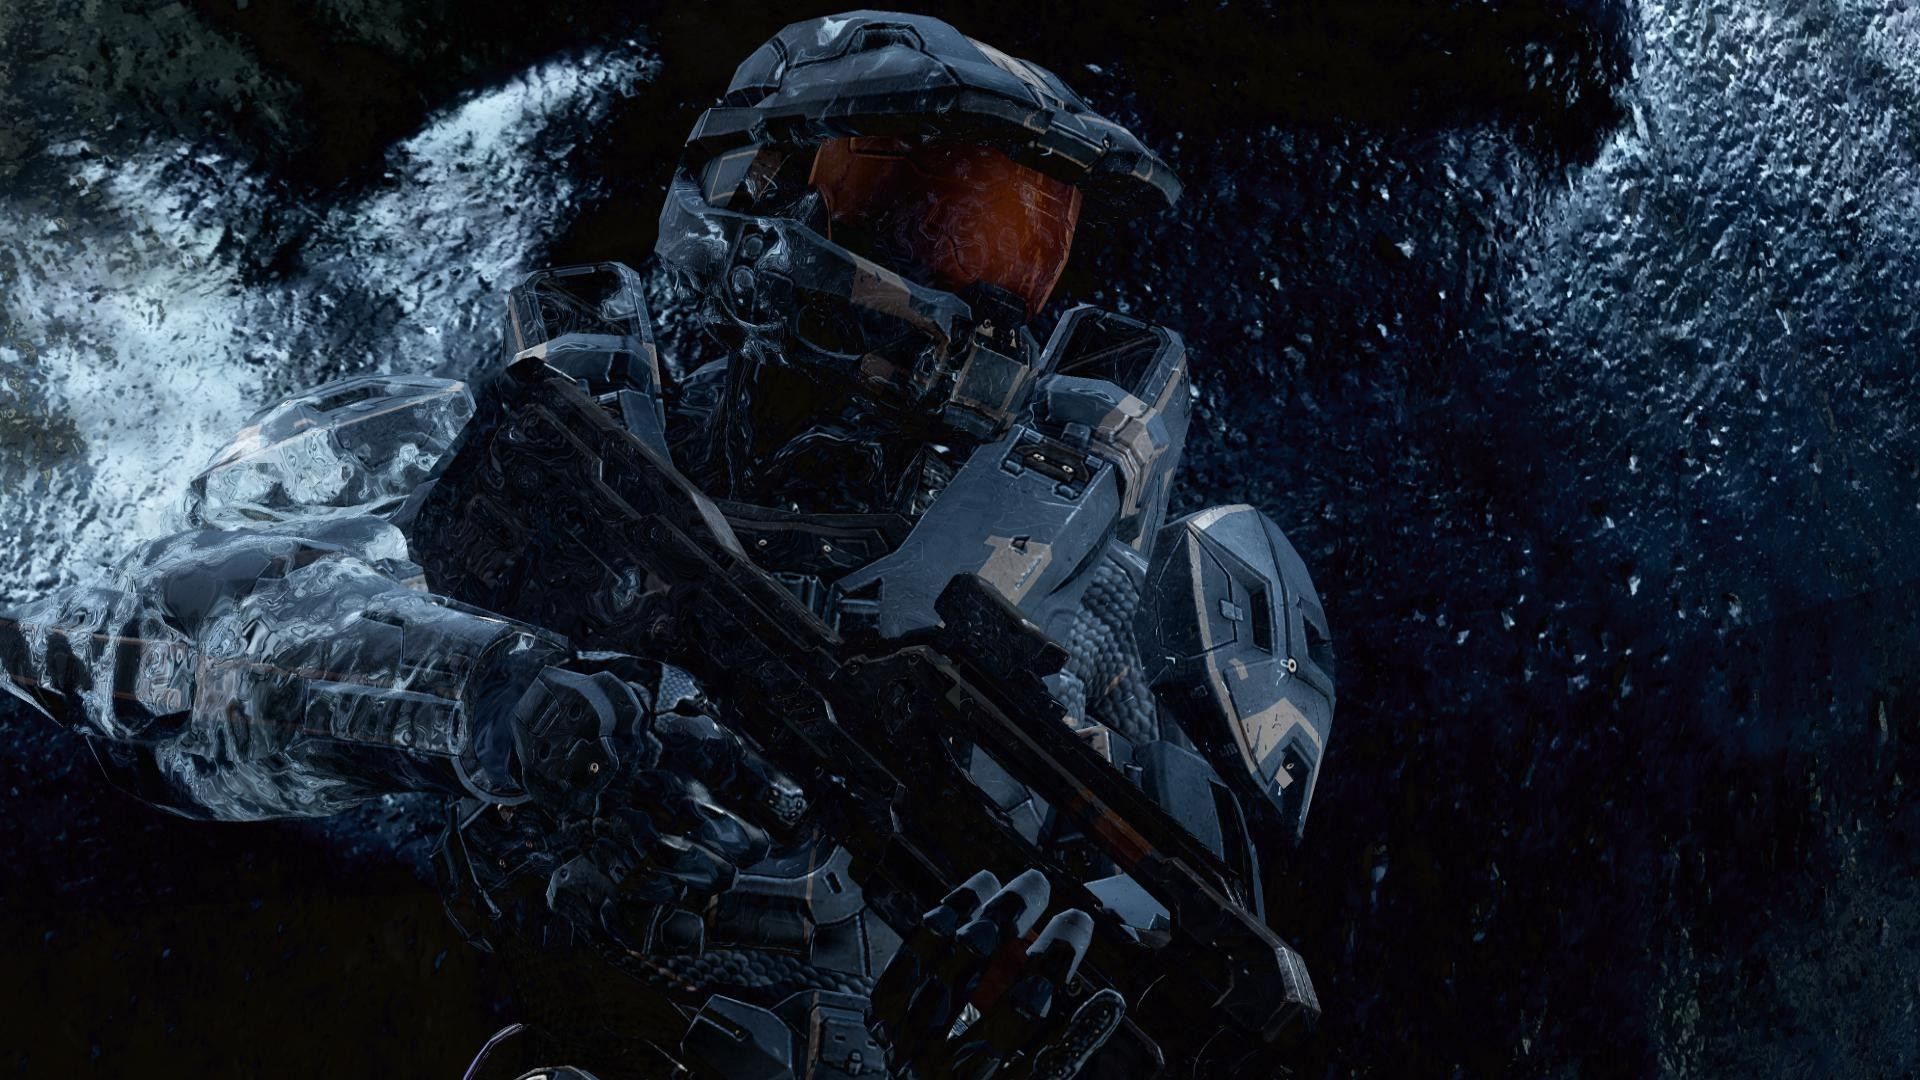 Halo 5 Blue Team Wallpaper – WallpaperSa.